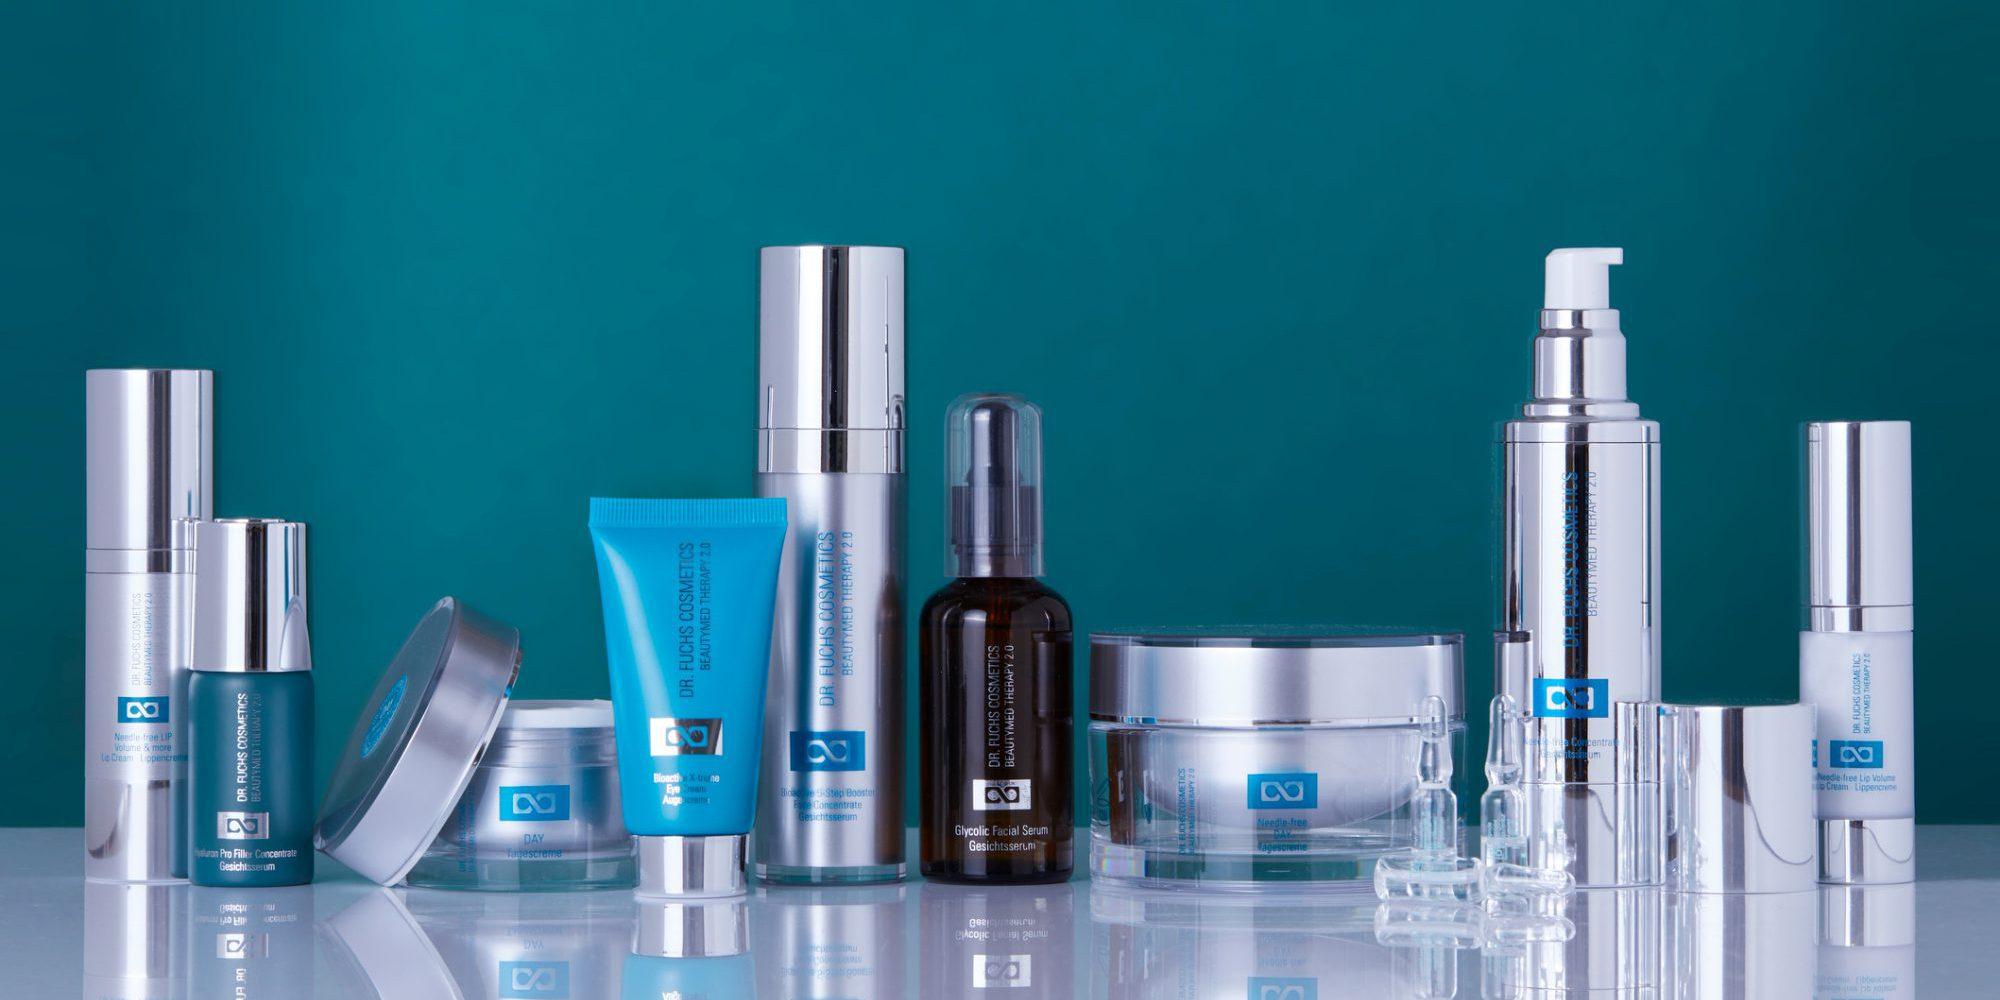 Produktfoto aller Produkte der Dr. Fuchs Cosmetics Beautymed Therapy 2.0